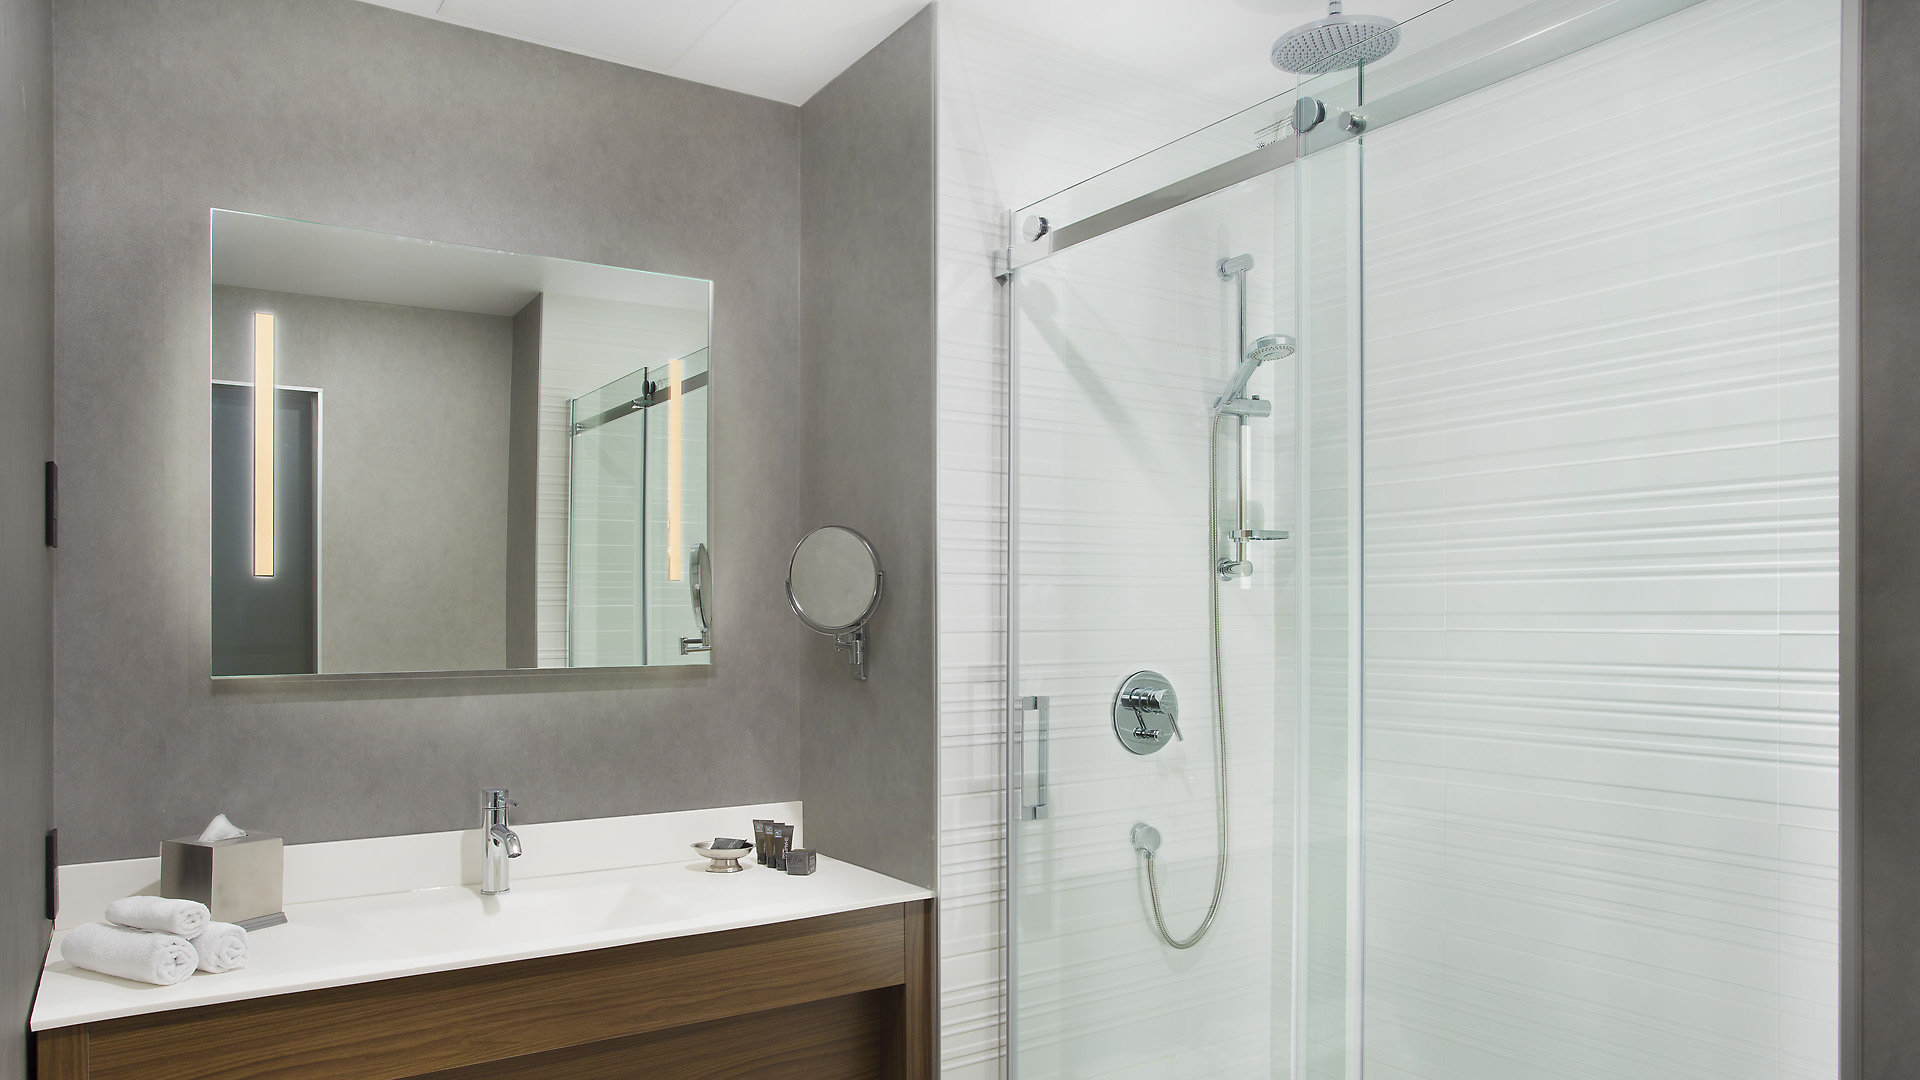 photographe-hospitality-montreal-photographer-hotel